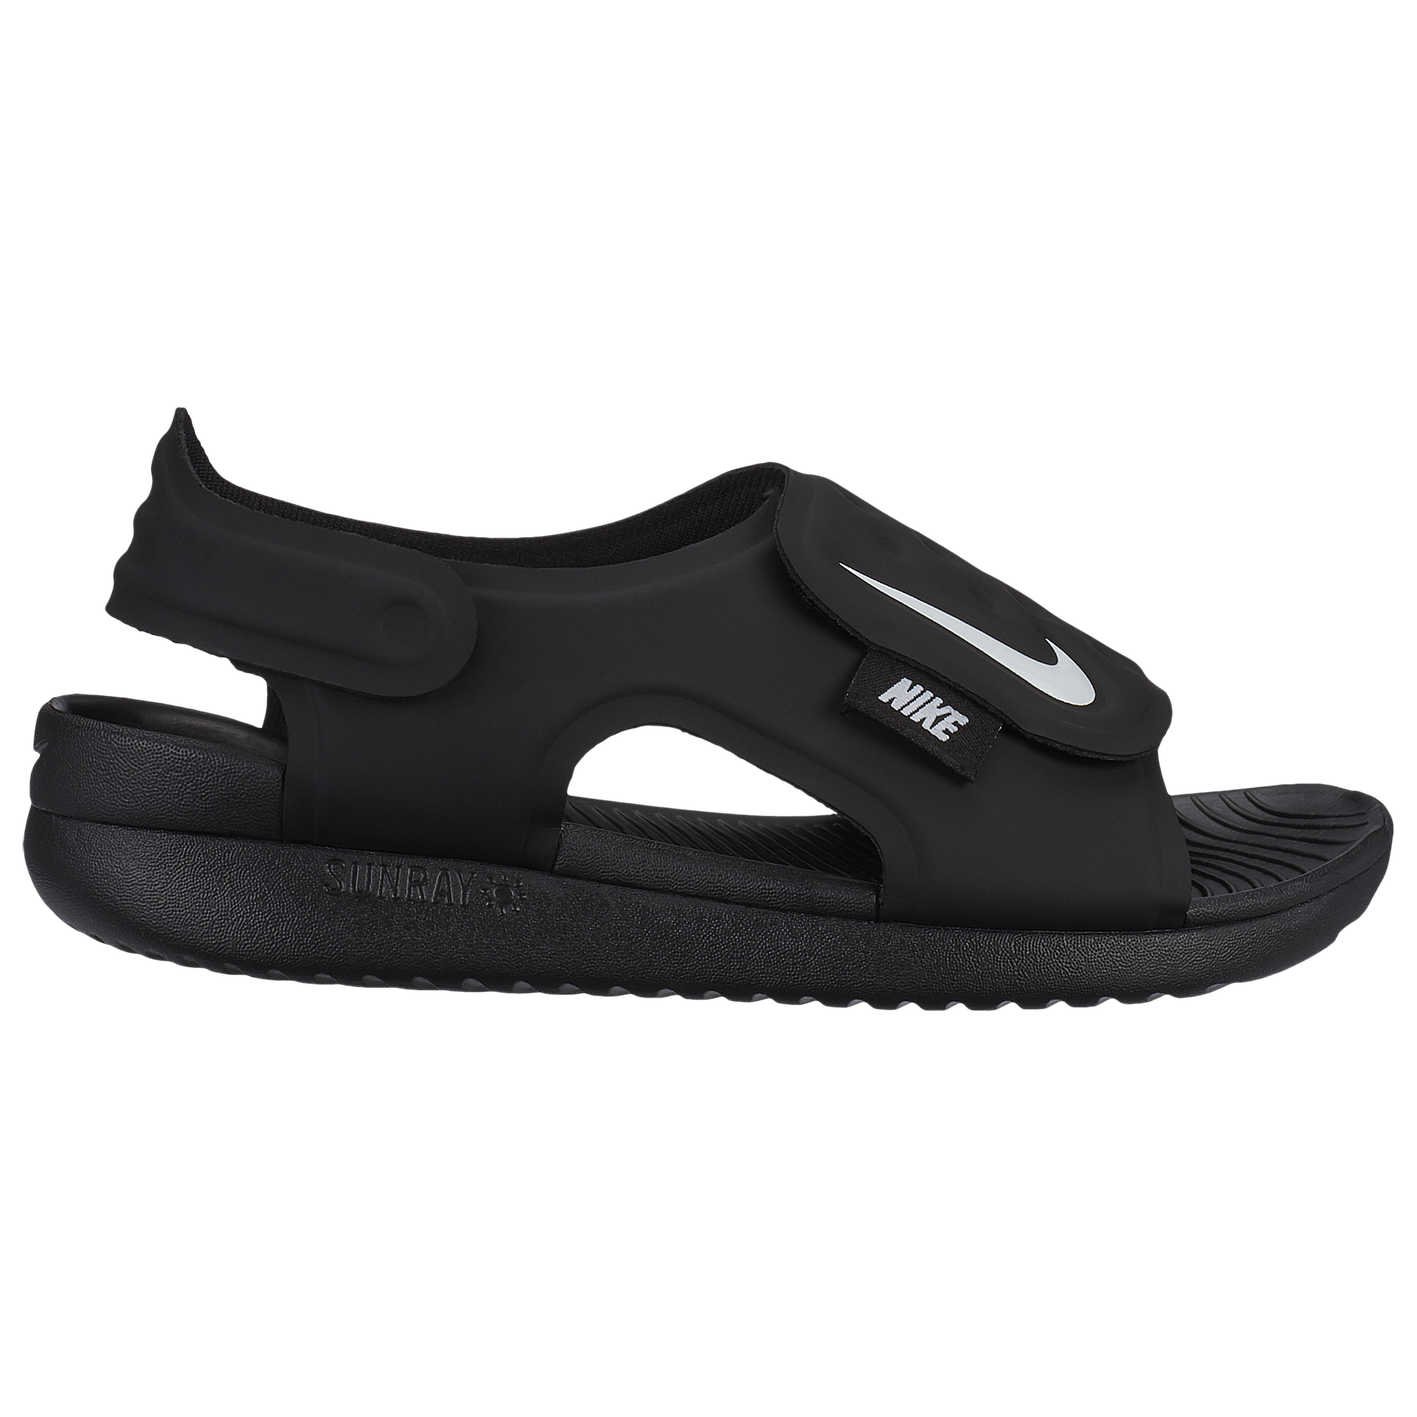 f55e13d931a8 Nike Sunray Adjust 5 Sandal - Boys  Grade School - Casual - Shoes ...